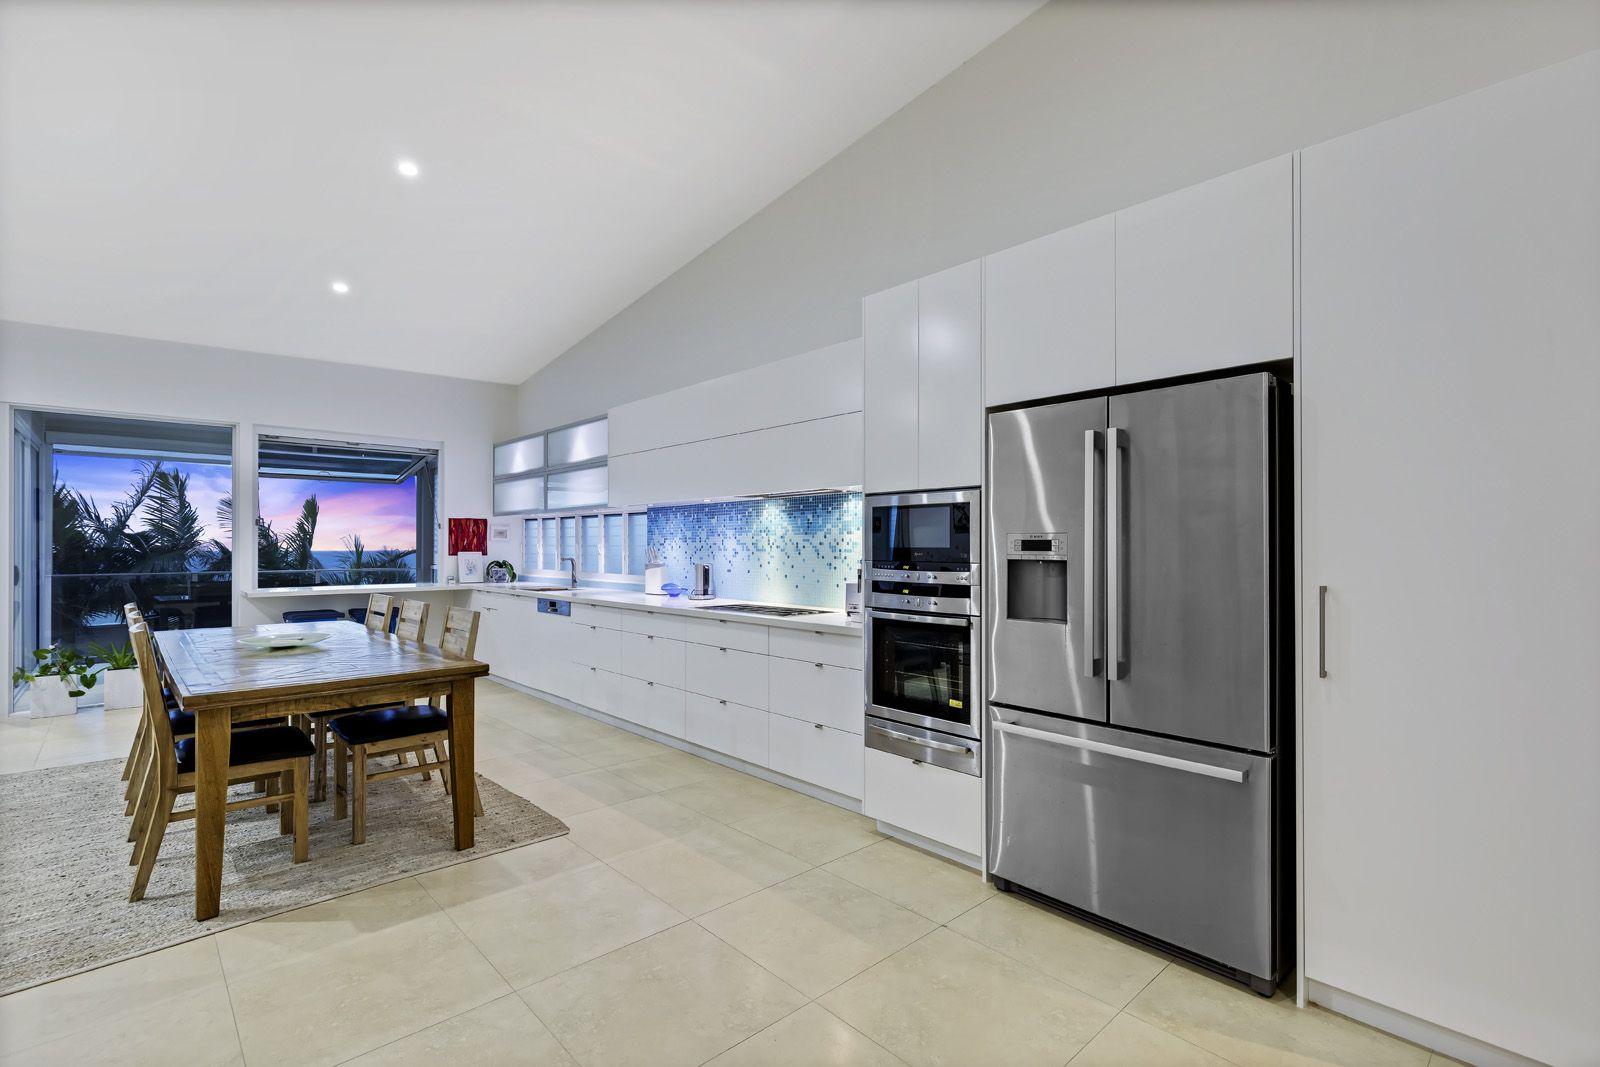 121 Coolum Terrace, Coolum Beach QLD 4573, Image 1